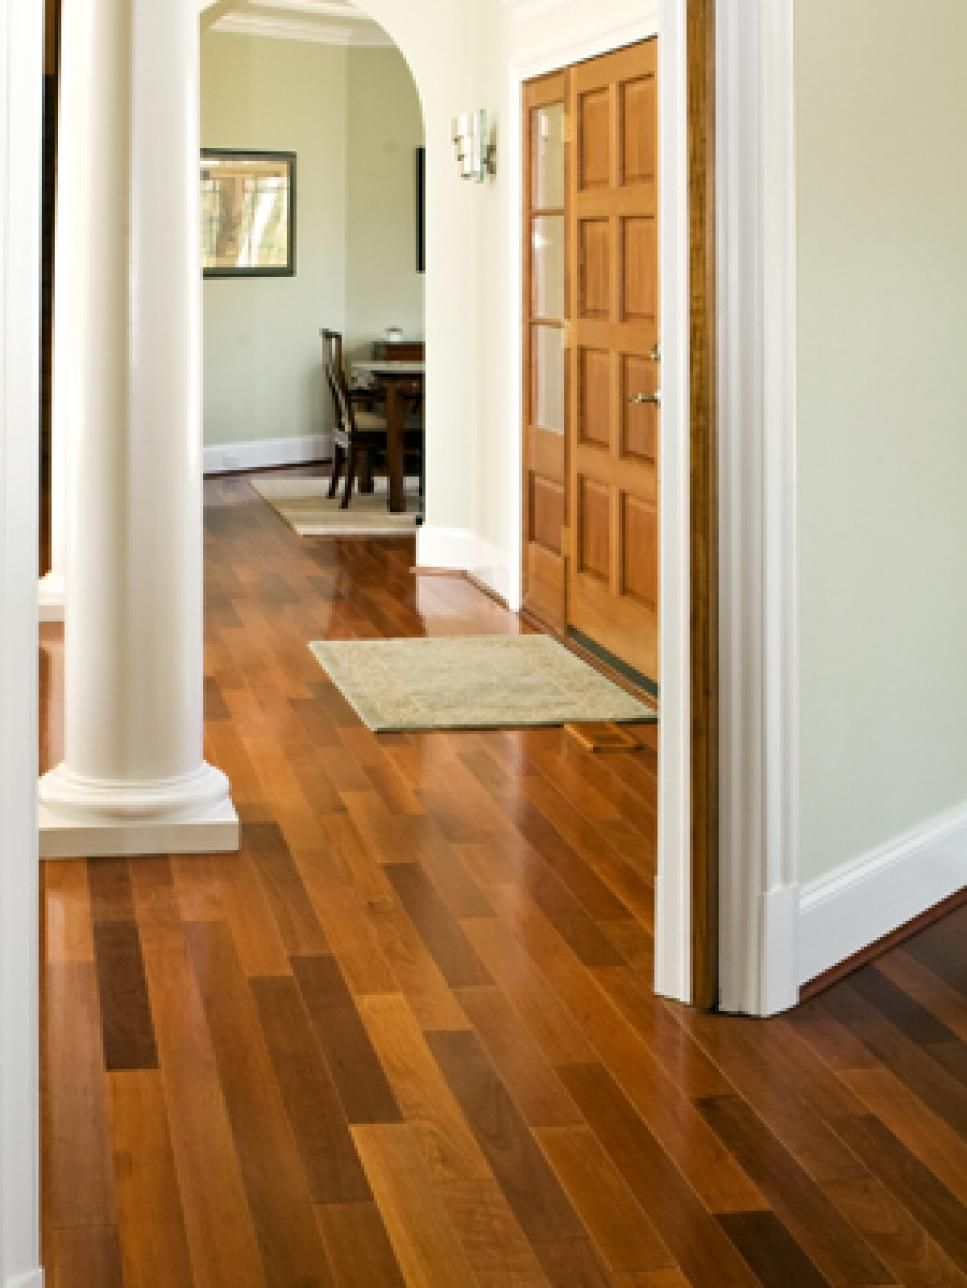 for rental elena choices floors low flooring maintenance property shallotte blog in elisseeva your ceramic tile floor